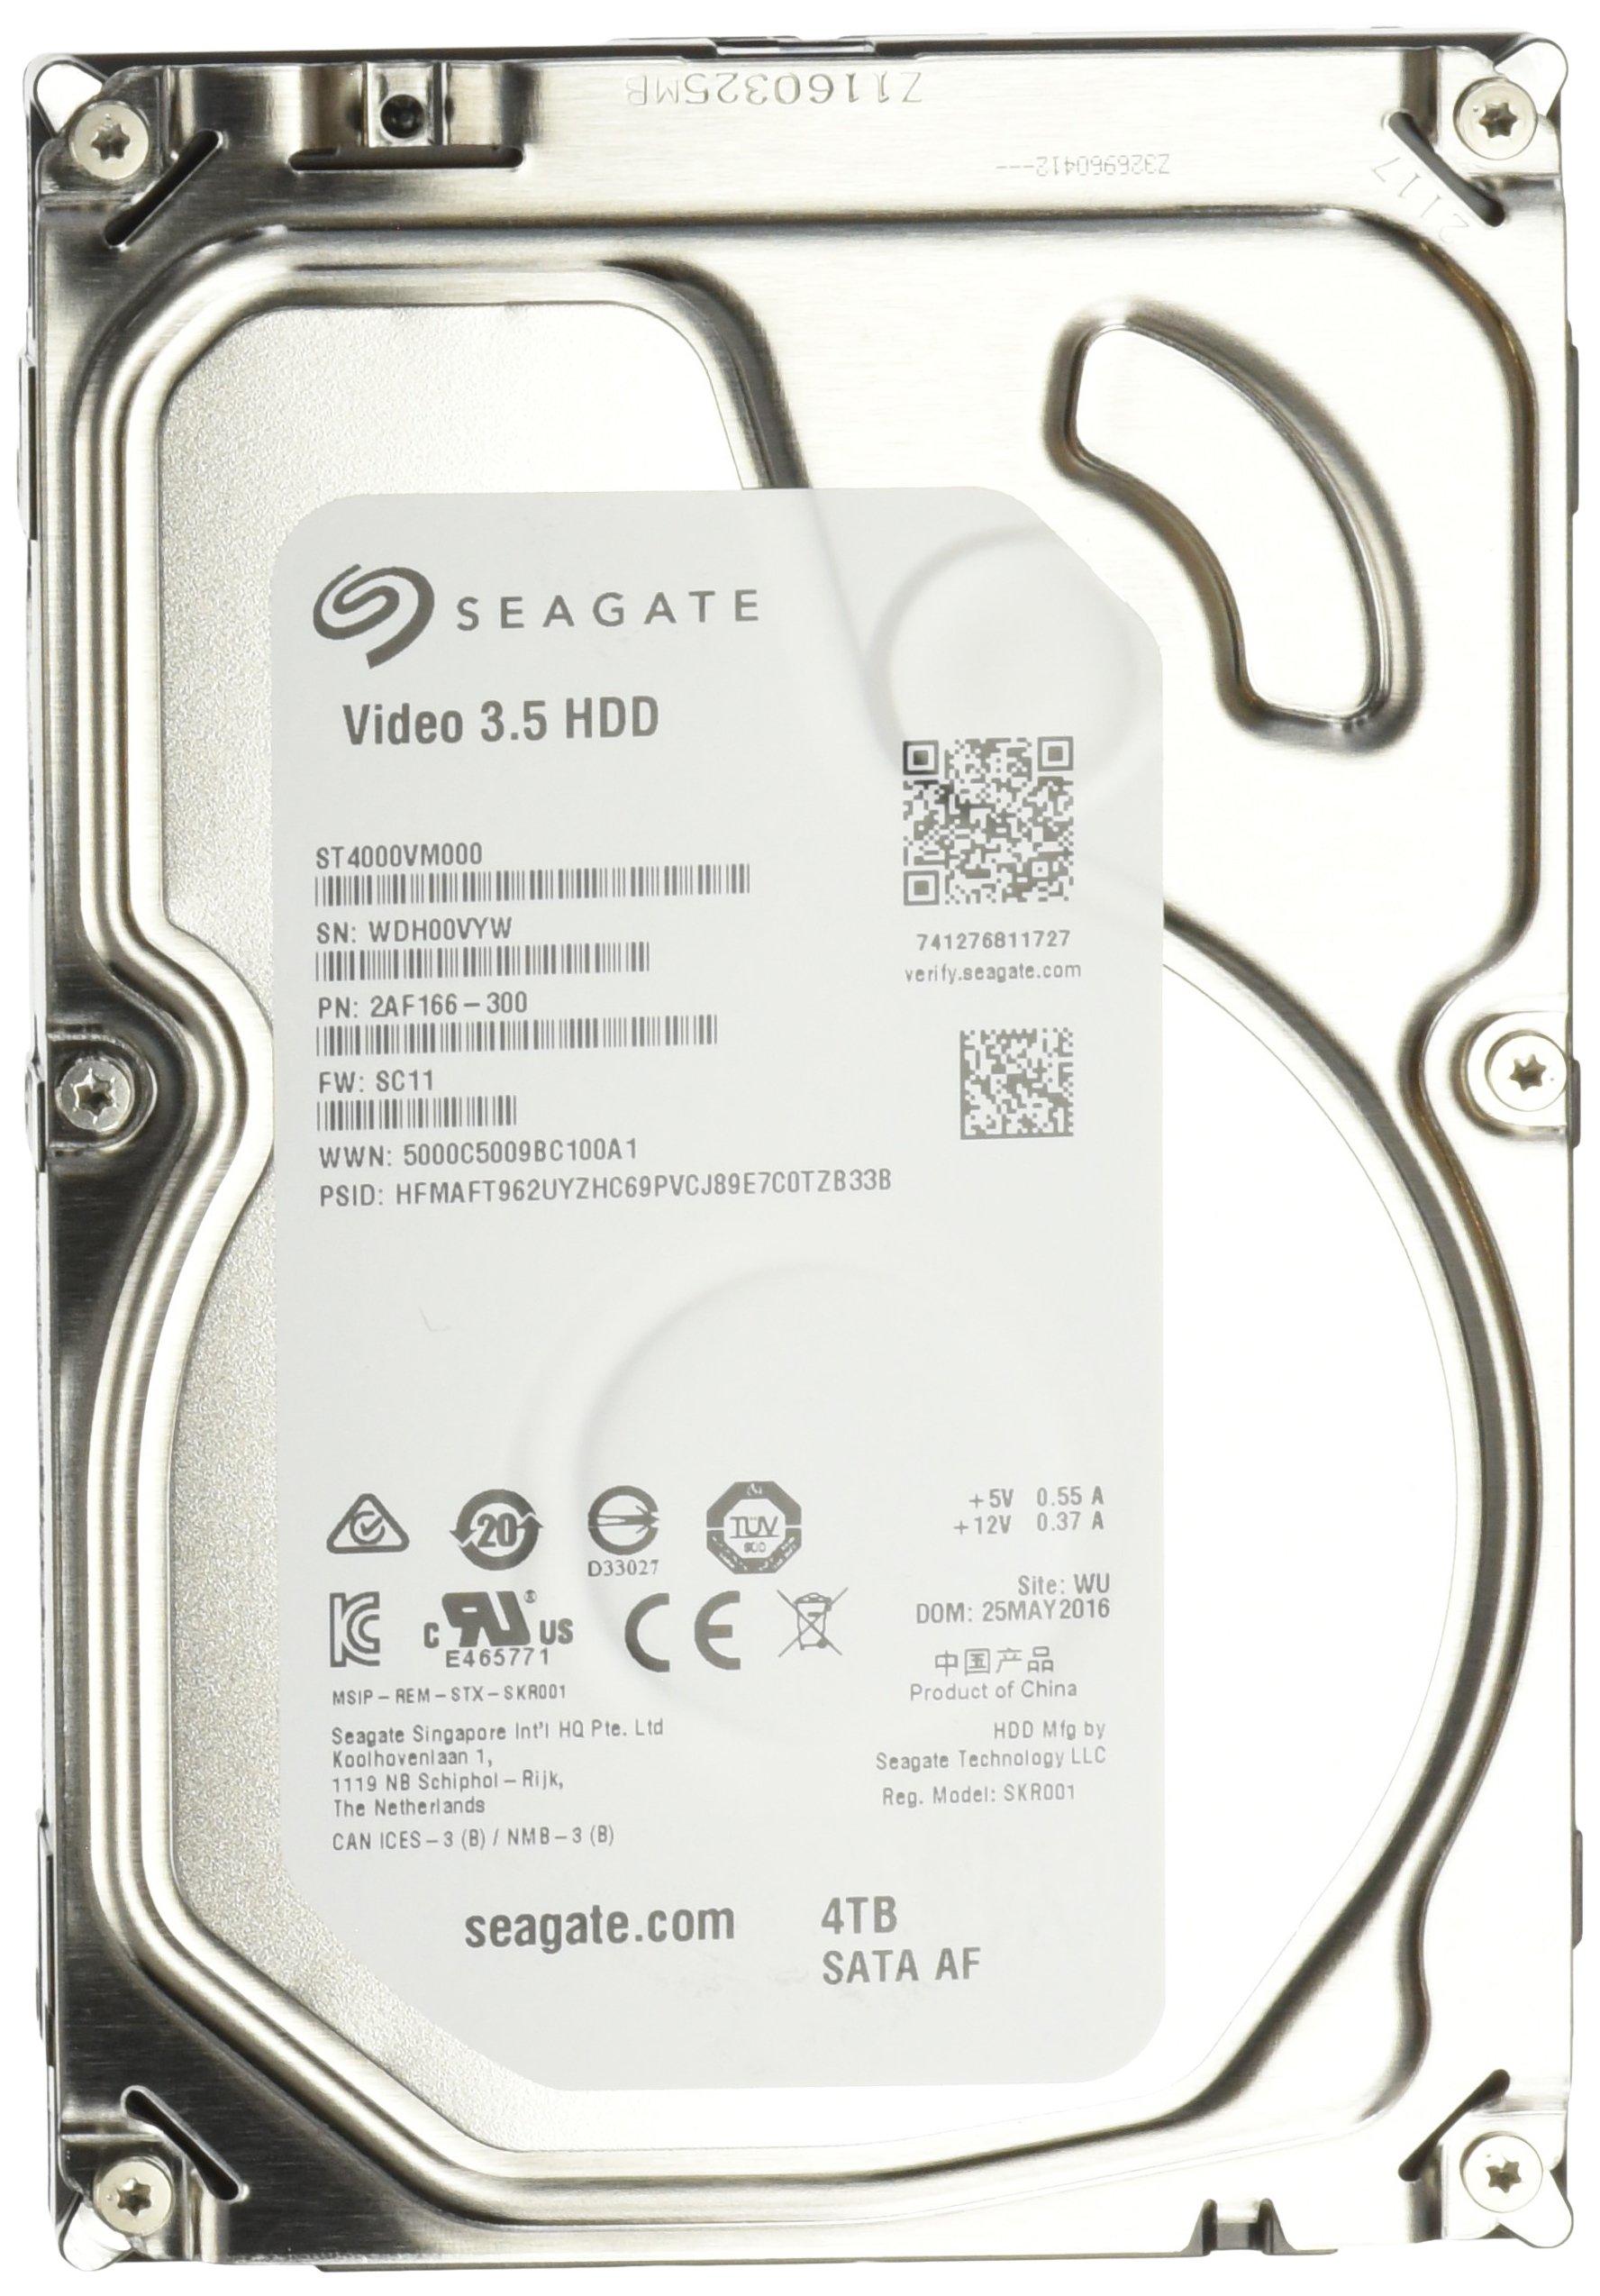 SEAGATE Video 3.5-Inch 4 TB 5900 RPM 64 MB Cache Internal Drive ST4000VM000